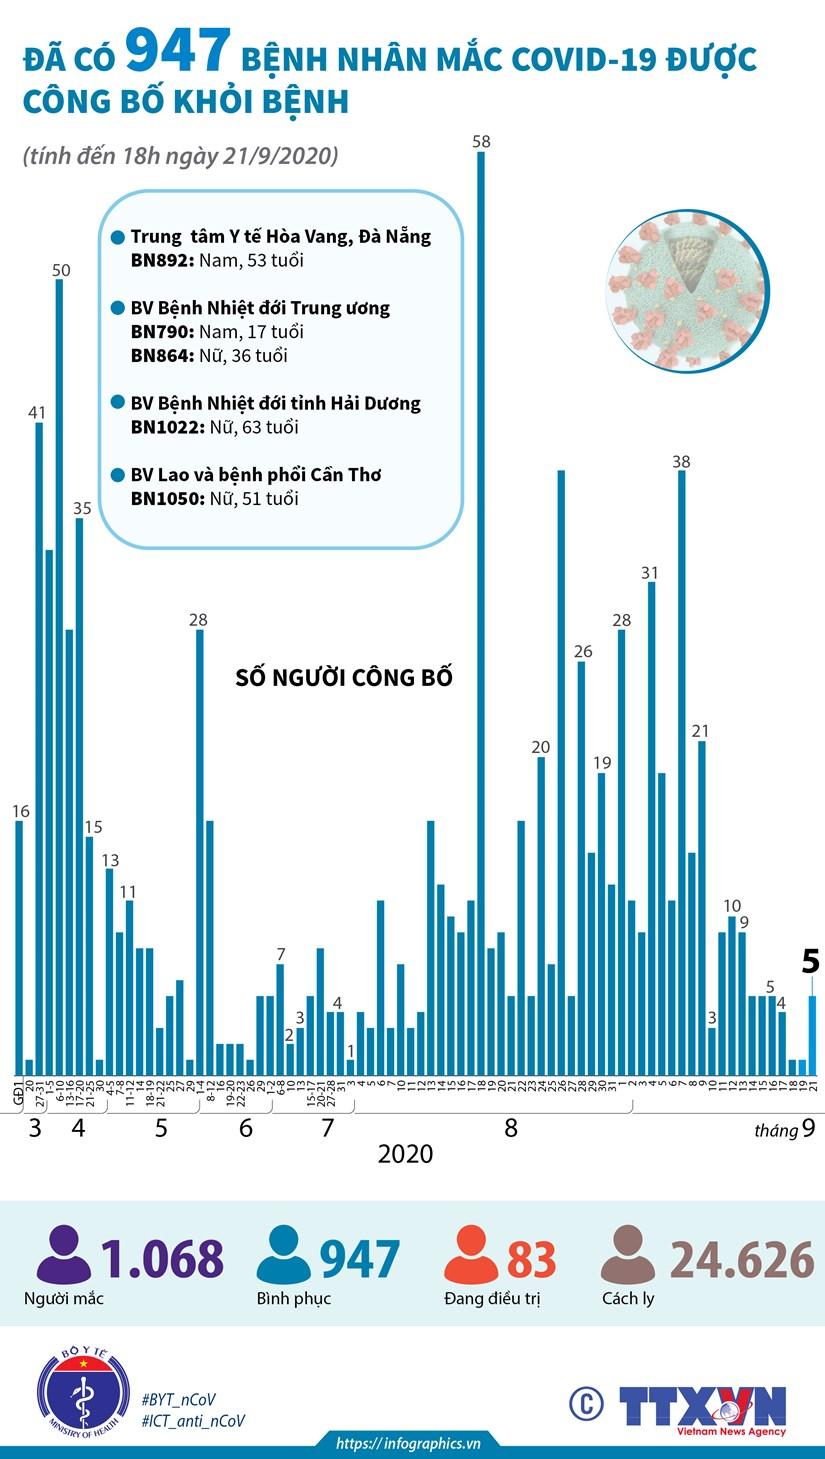 [Infographics] Da co 947 benh nhan mac COVID-19 duoc cong bo khoi benh hinh anh 1